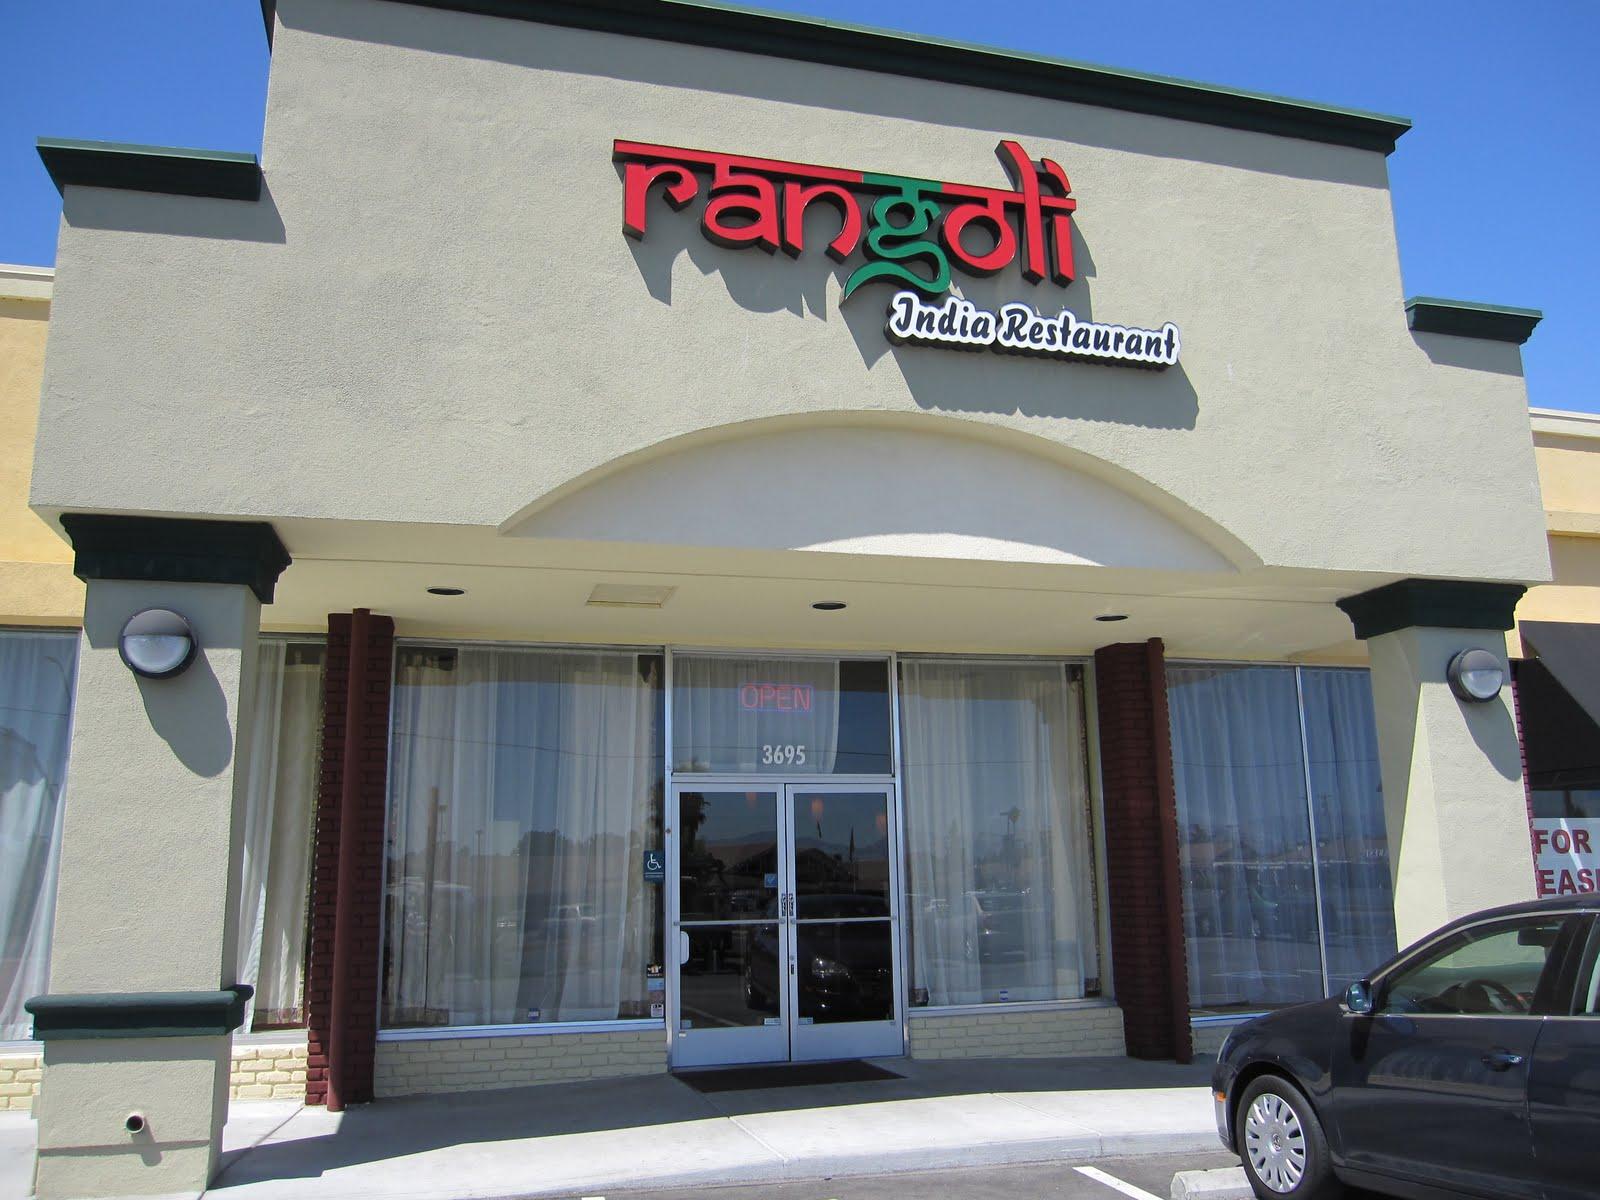 Rangoli Indian Restaurant Chicago